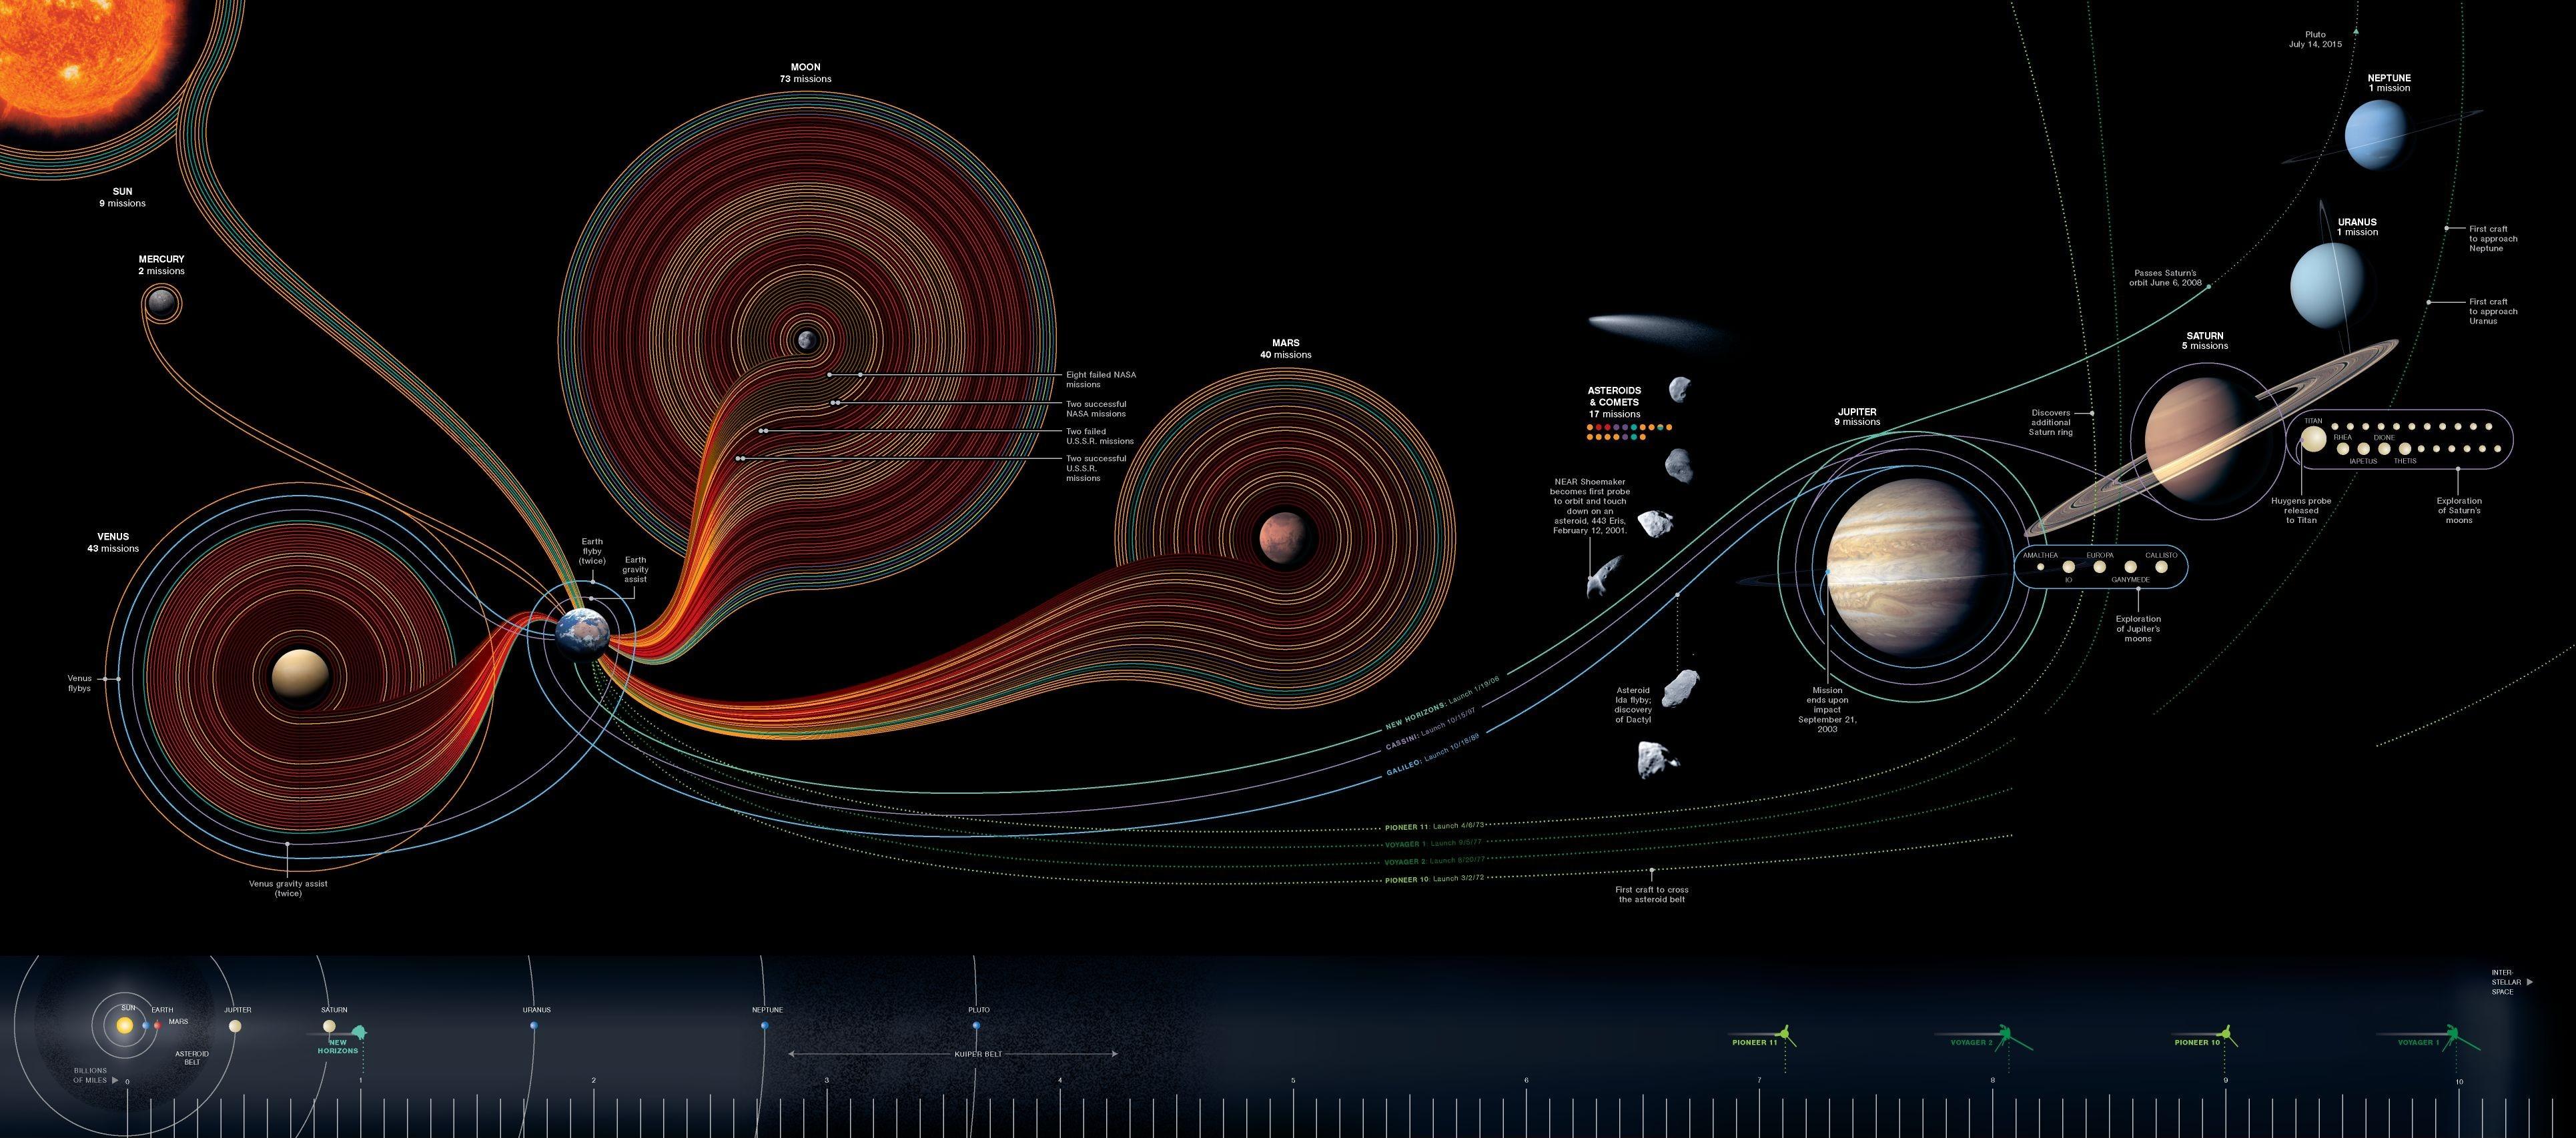 Timeline of Solar System exploration